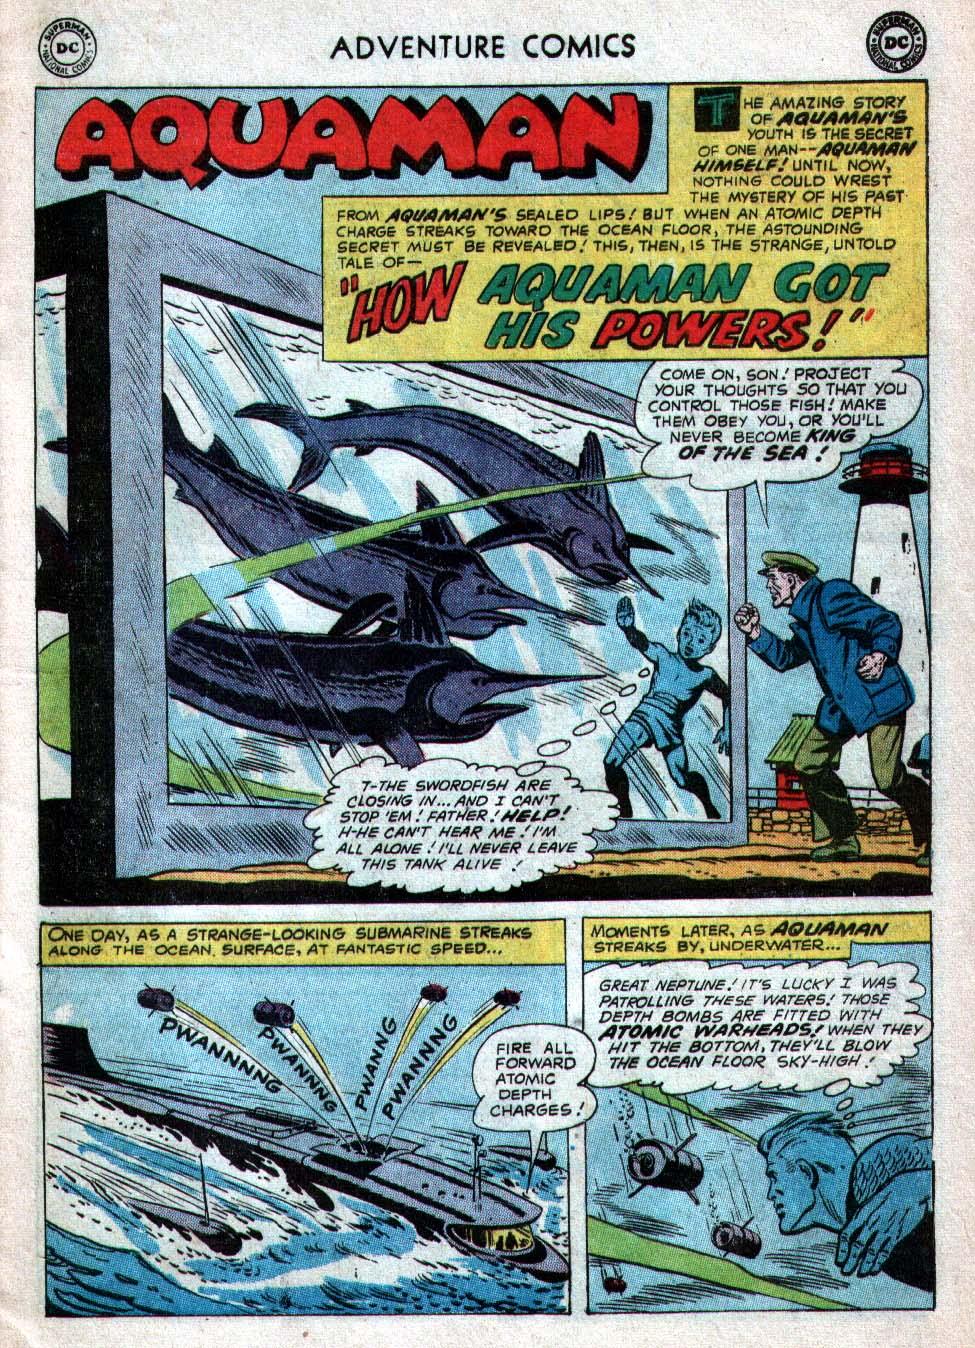 "ADVENTURE COMICS #260 - ""How Aquaman Got His Powers"", by Robert Bernstein and Ramona Fradon"